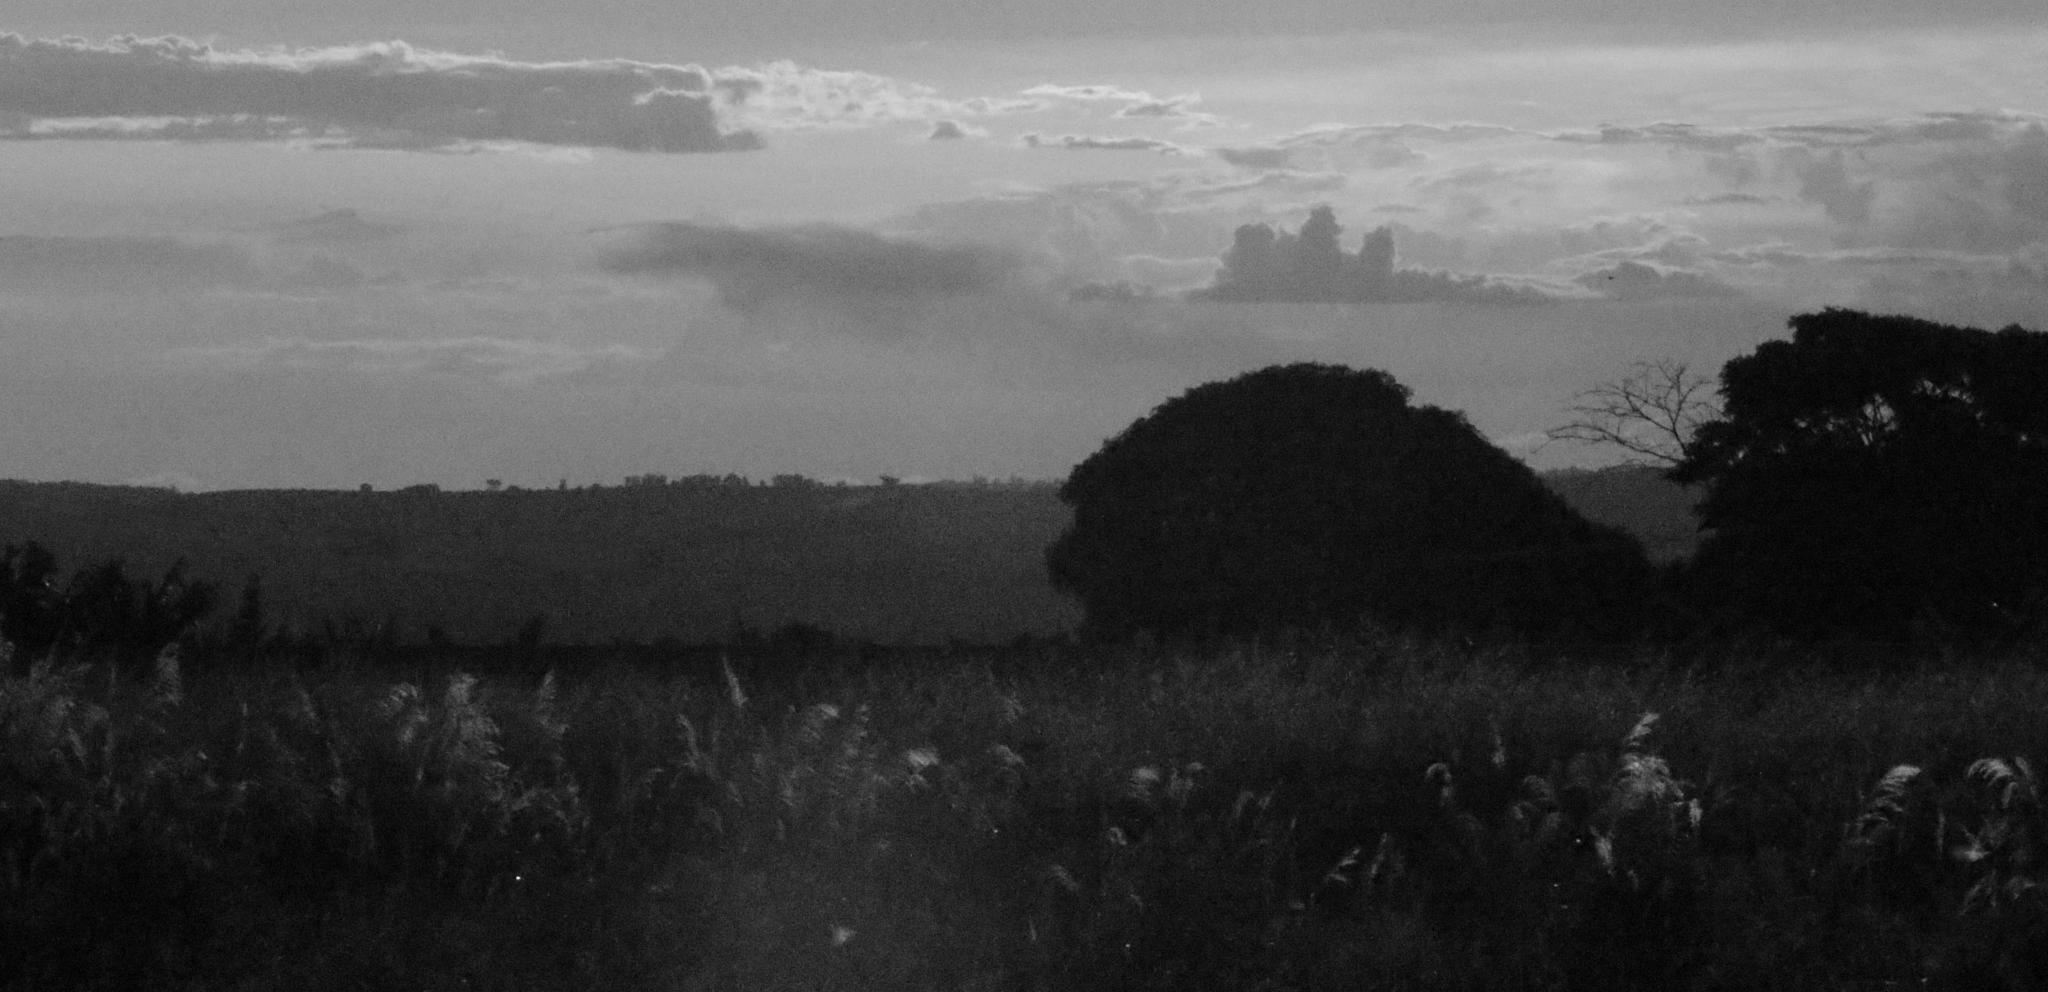 The neverland of silence by marceloazevedo1972